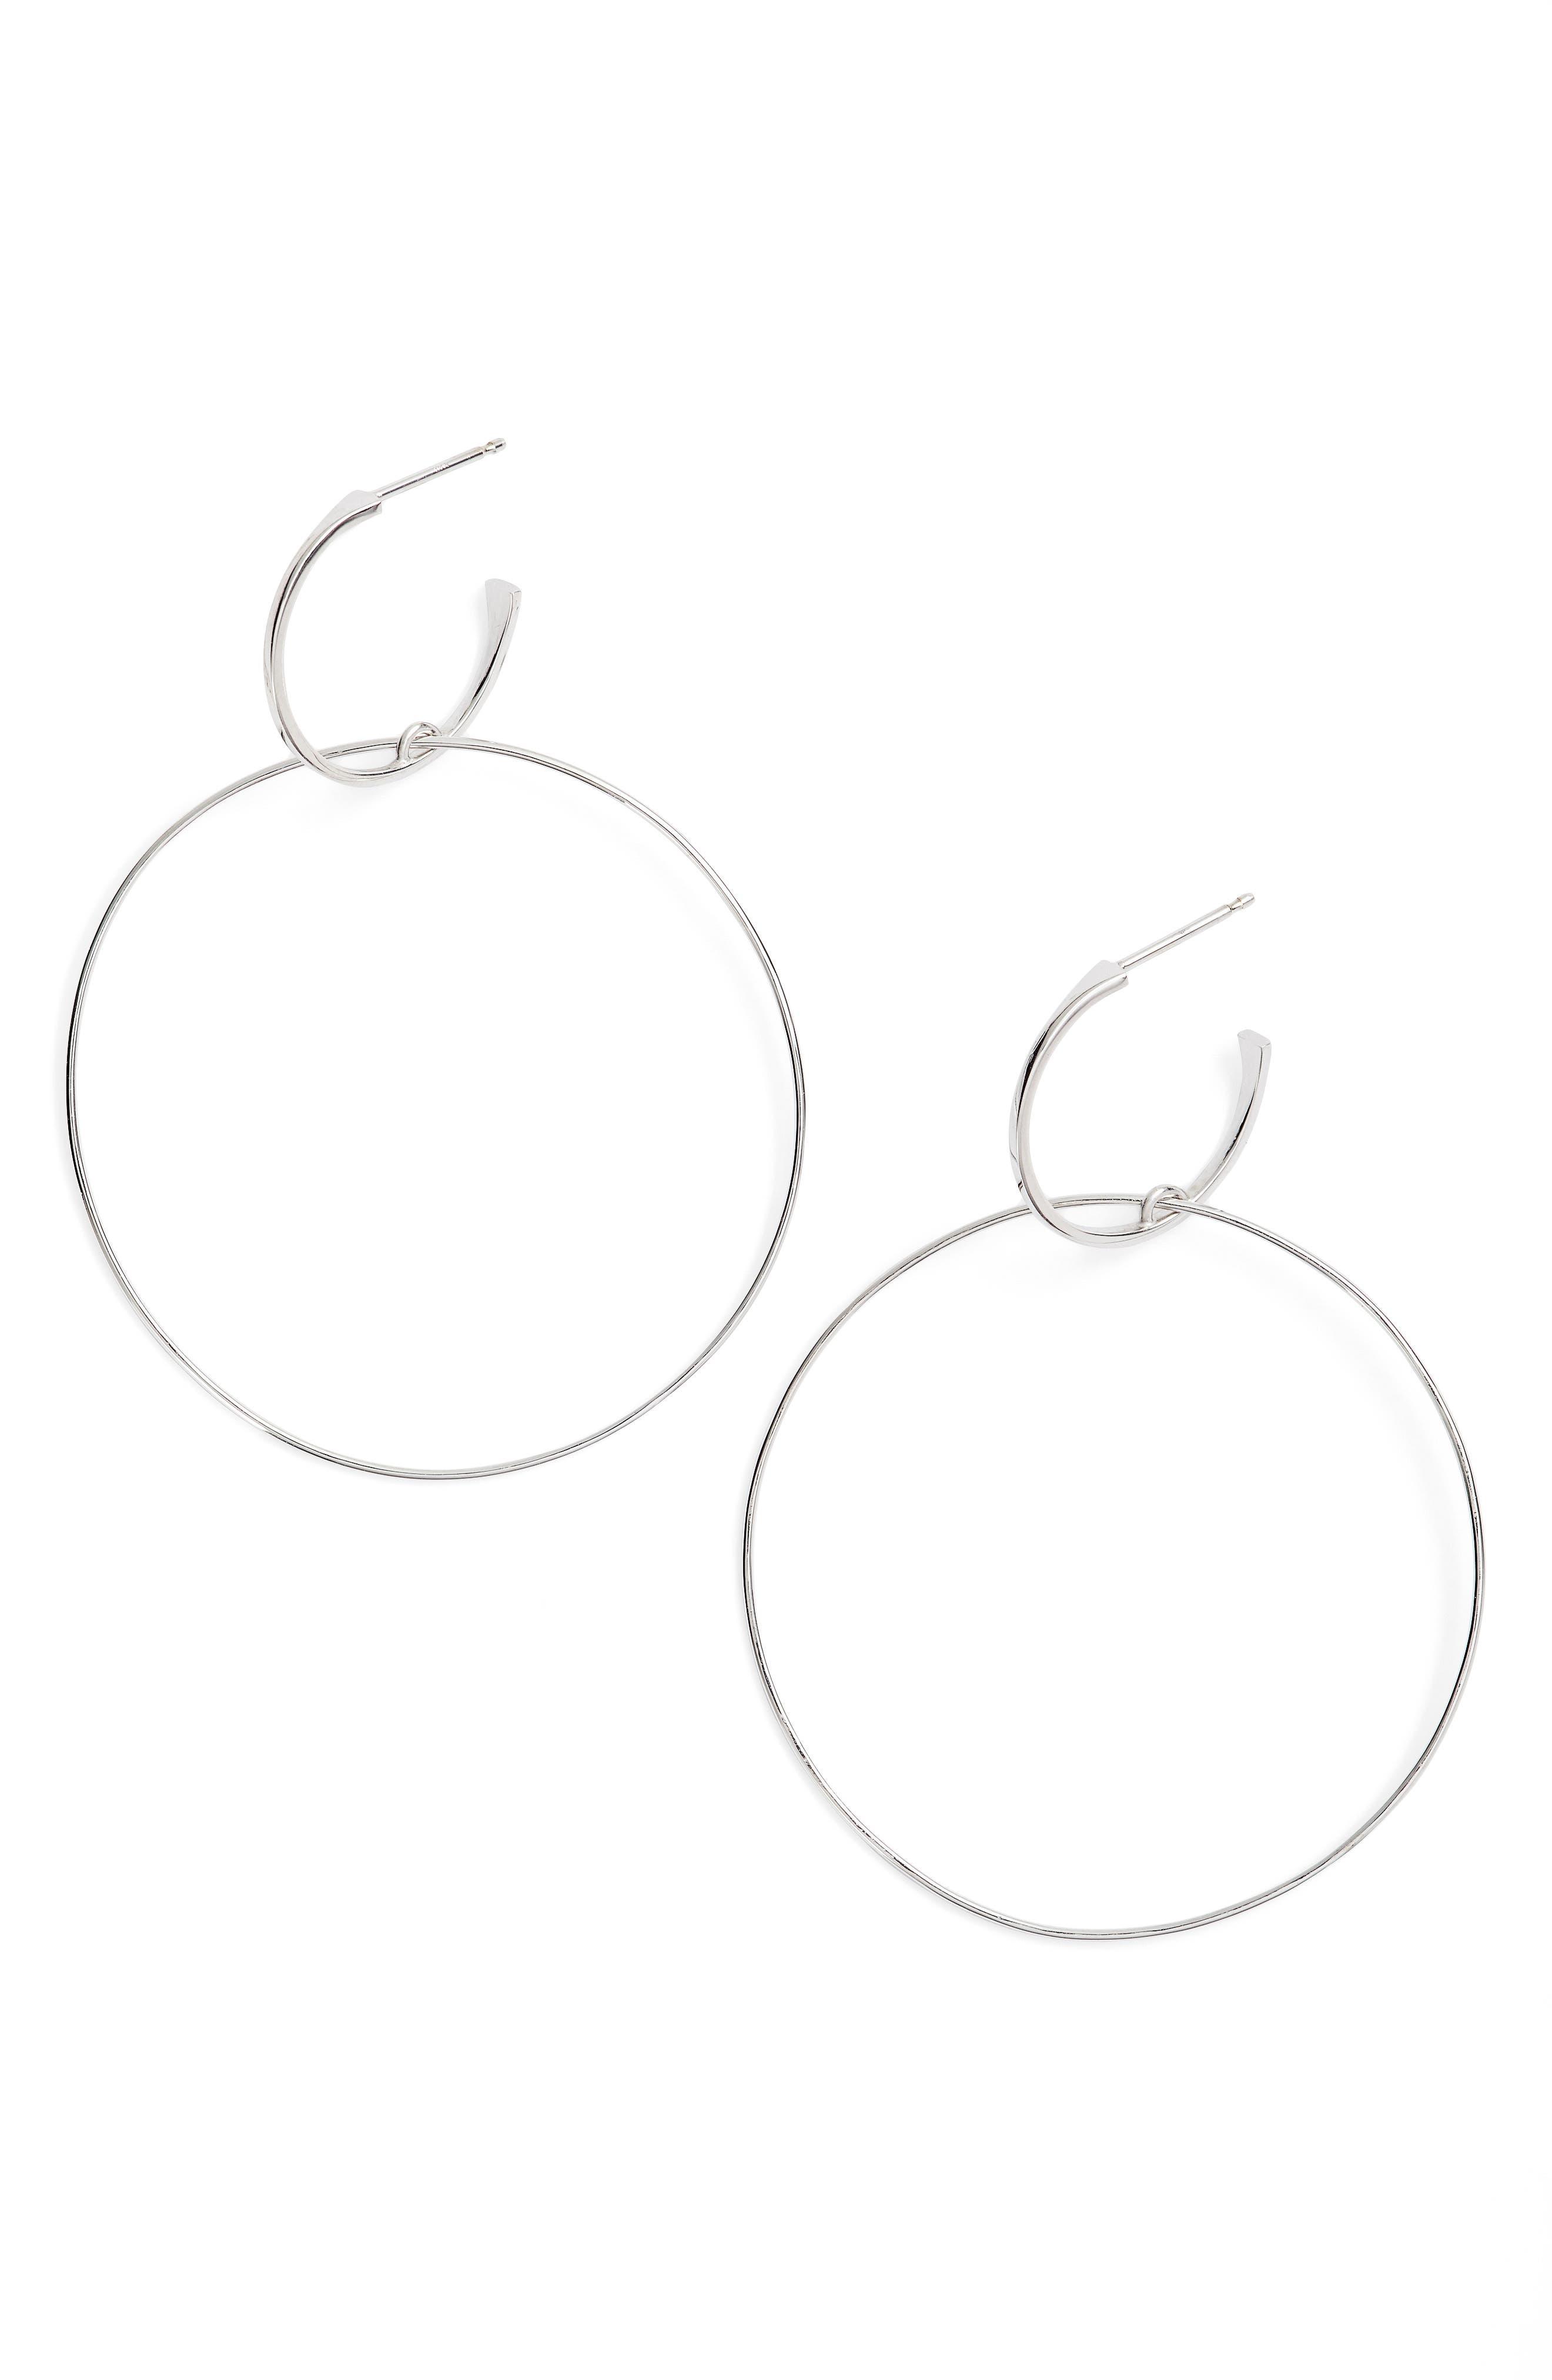 Bond Small Double Hoop Earrings,                             Main thumbnail 1, color,                             White Gold